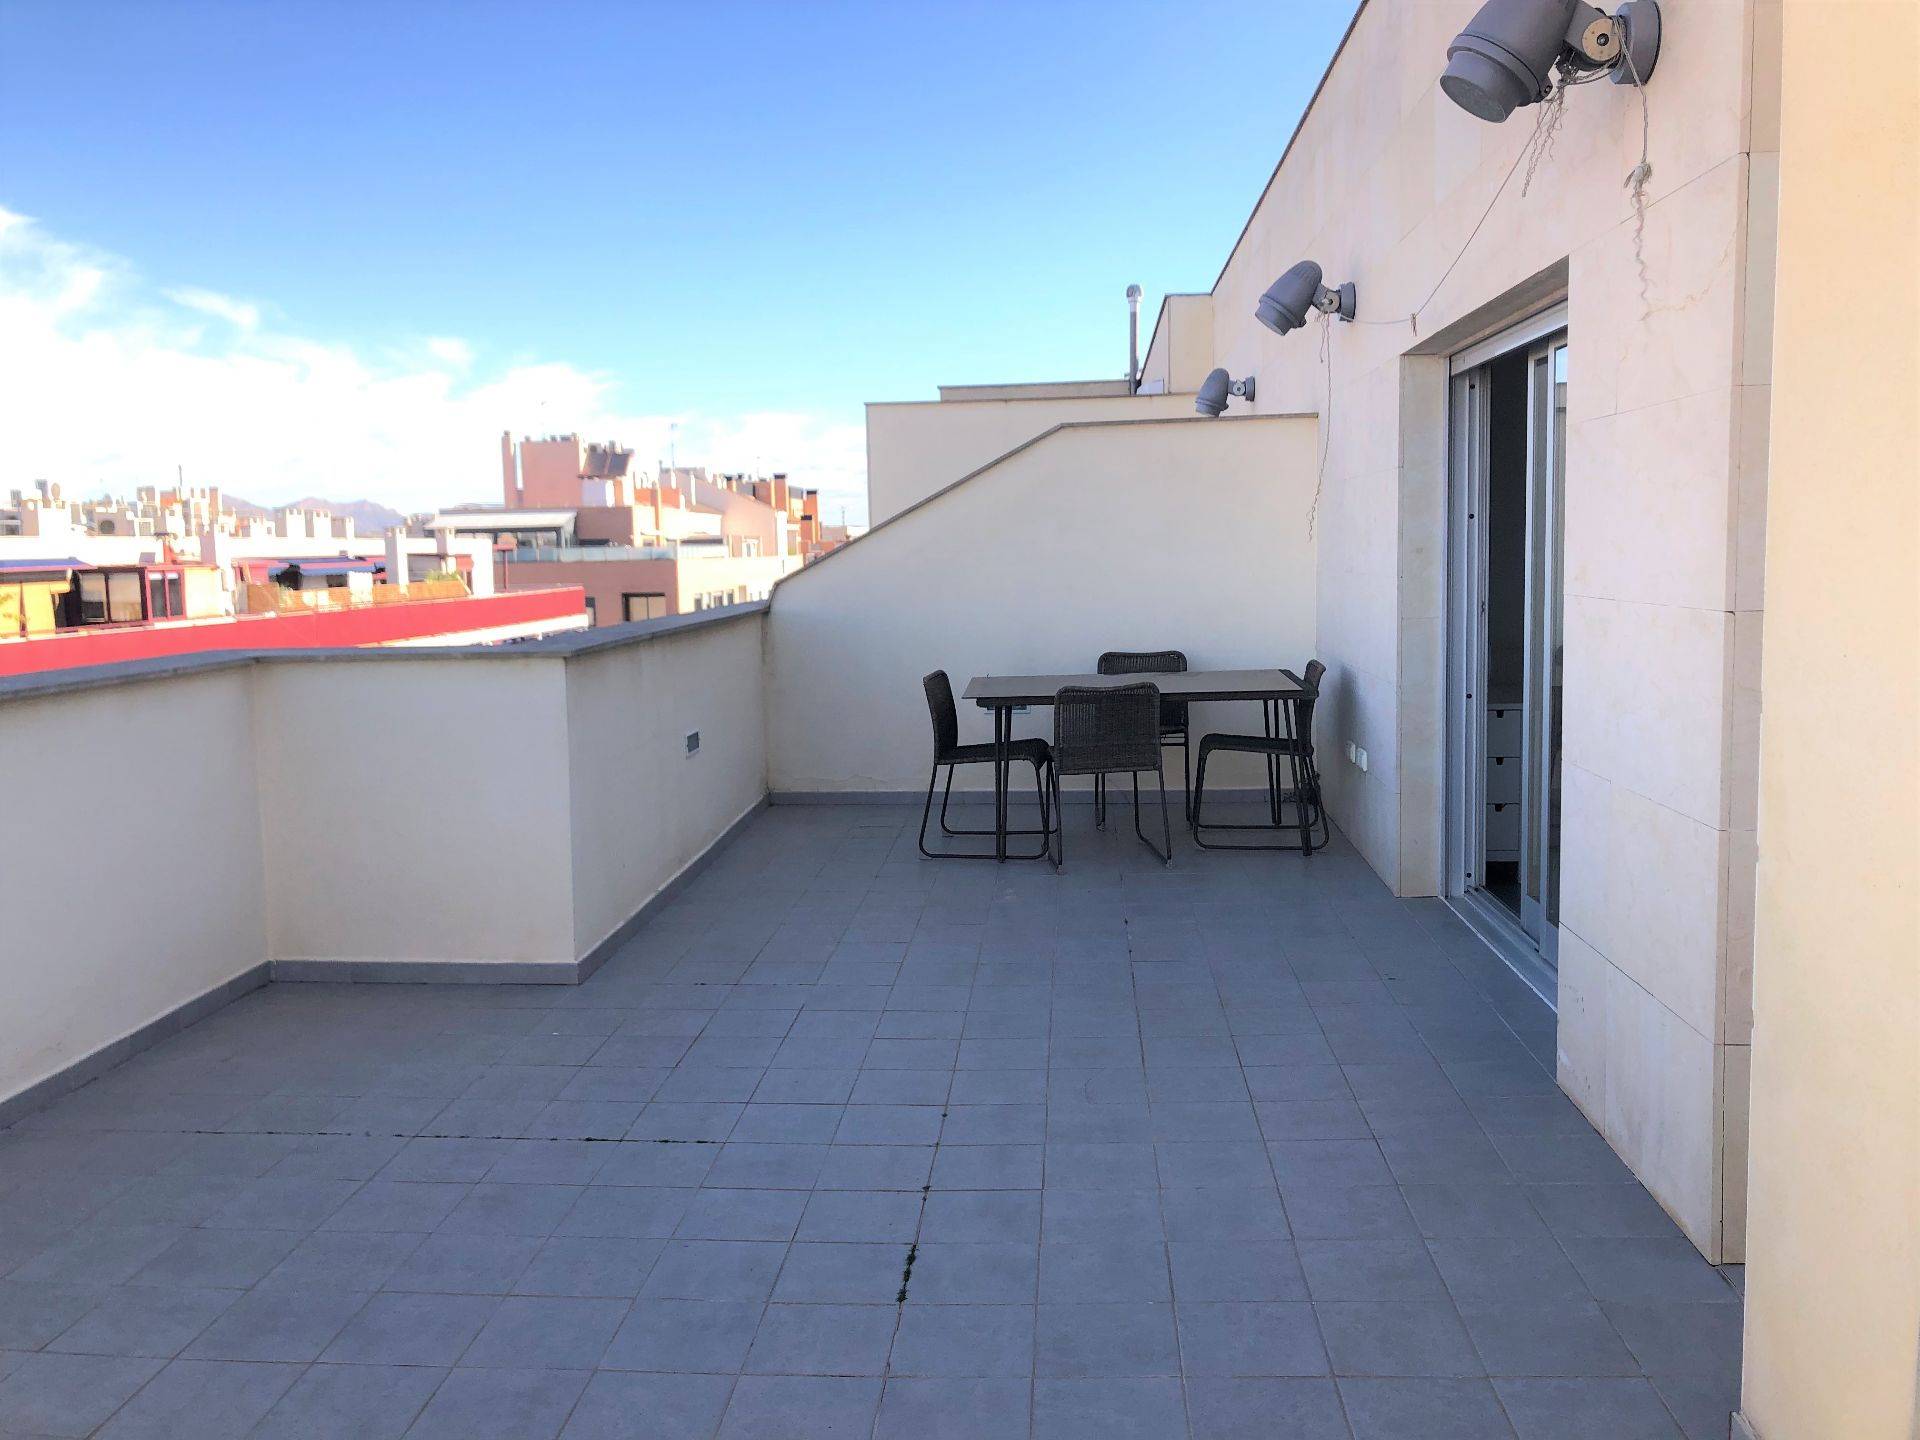 Apartamento en Murcia, JUAN DE BORBON, alquiler